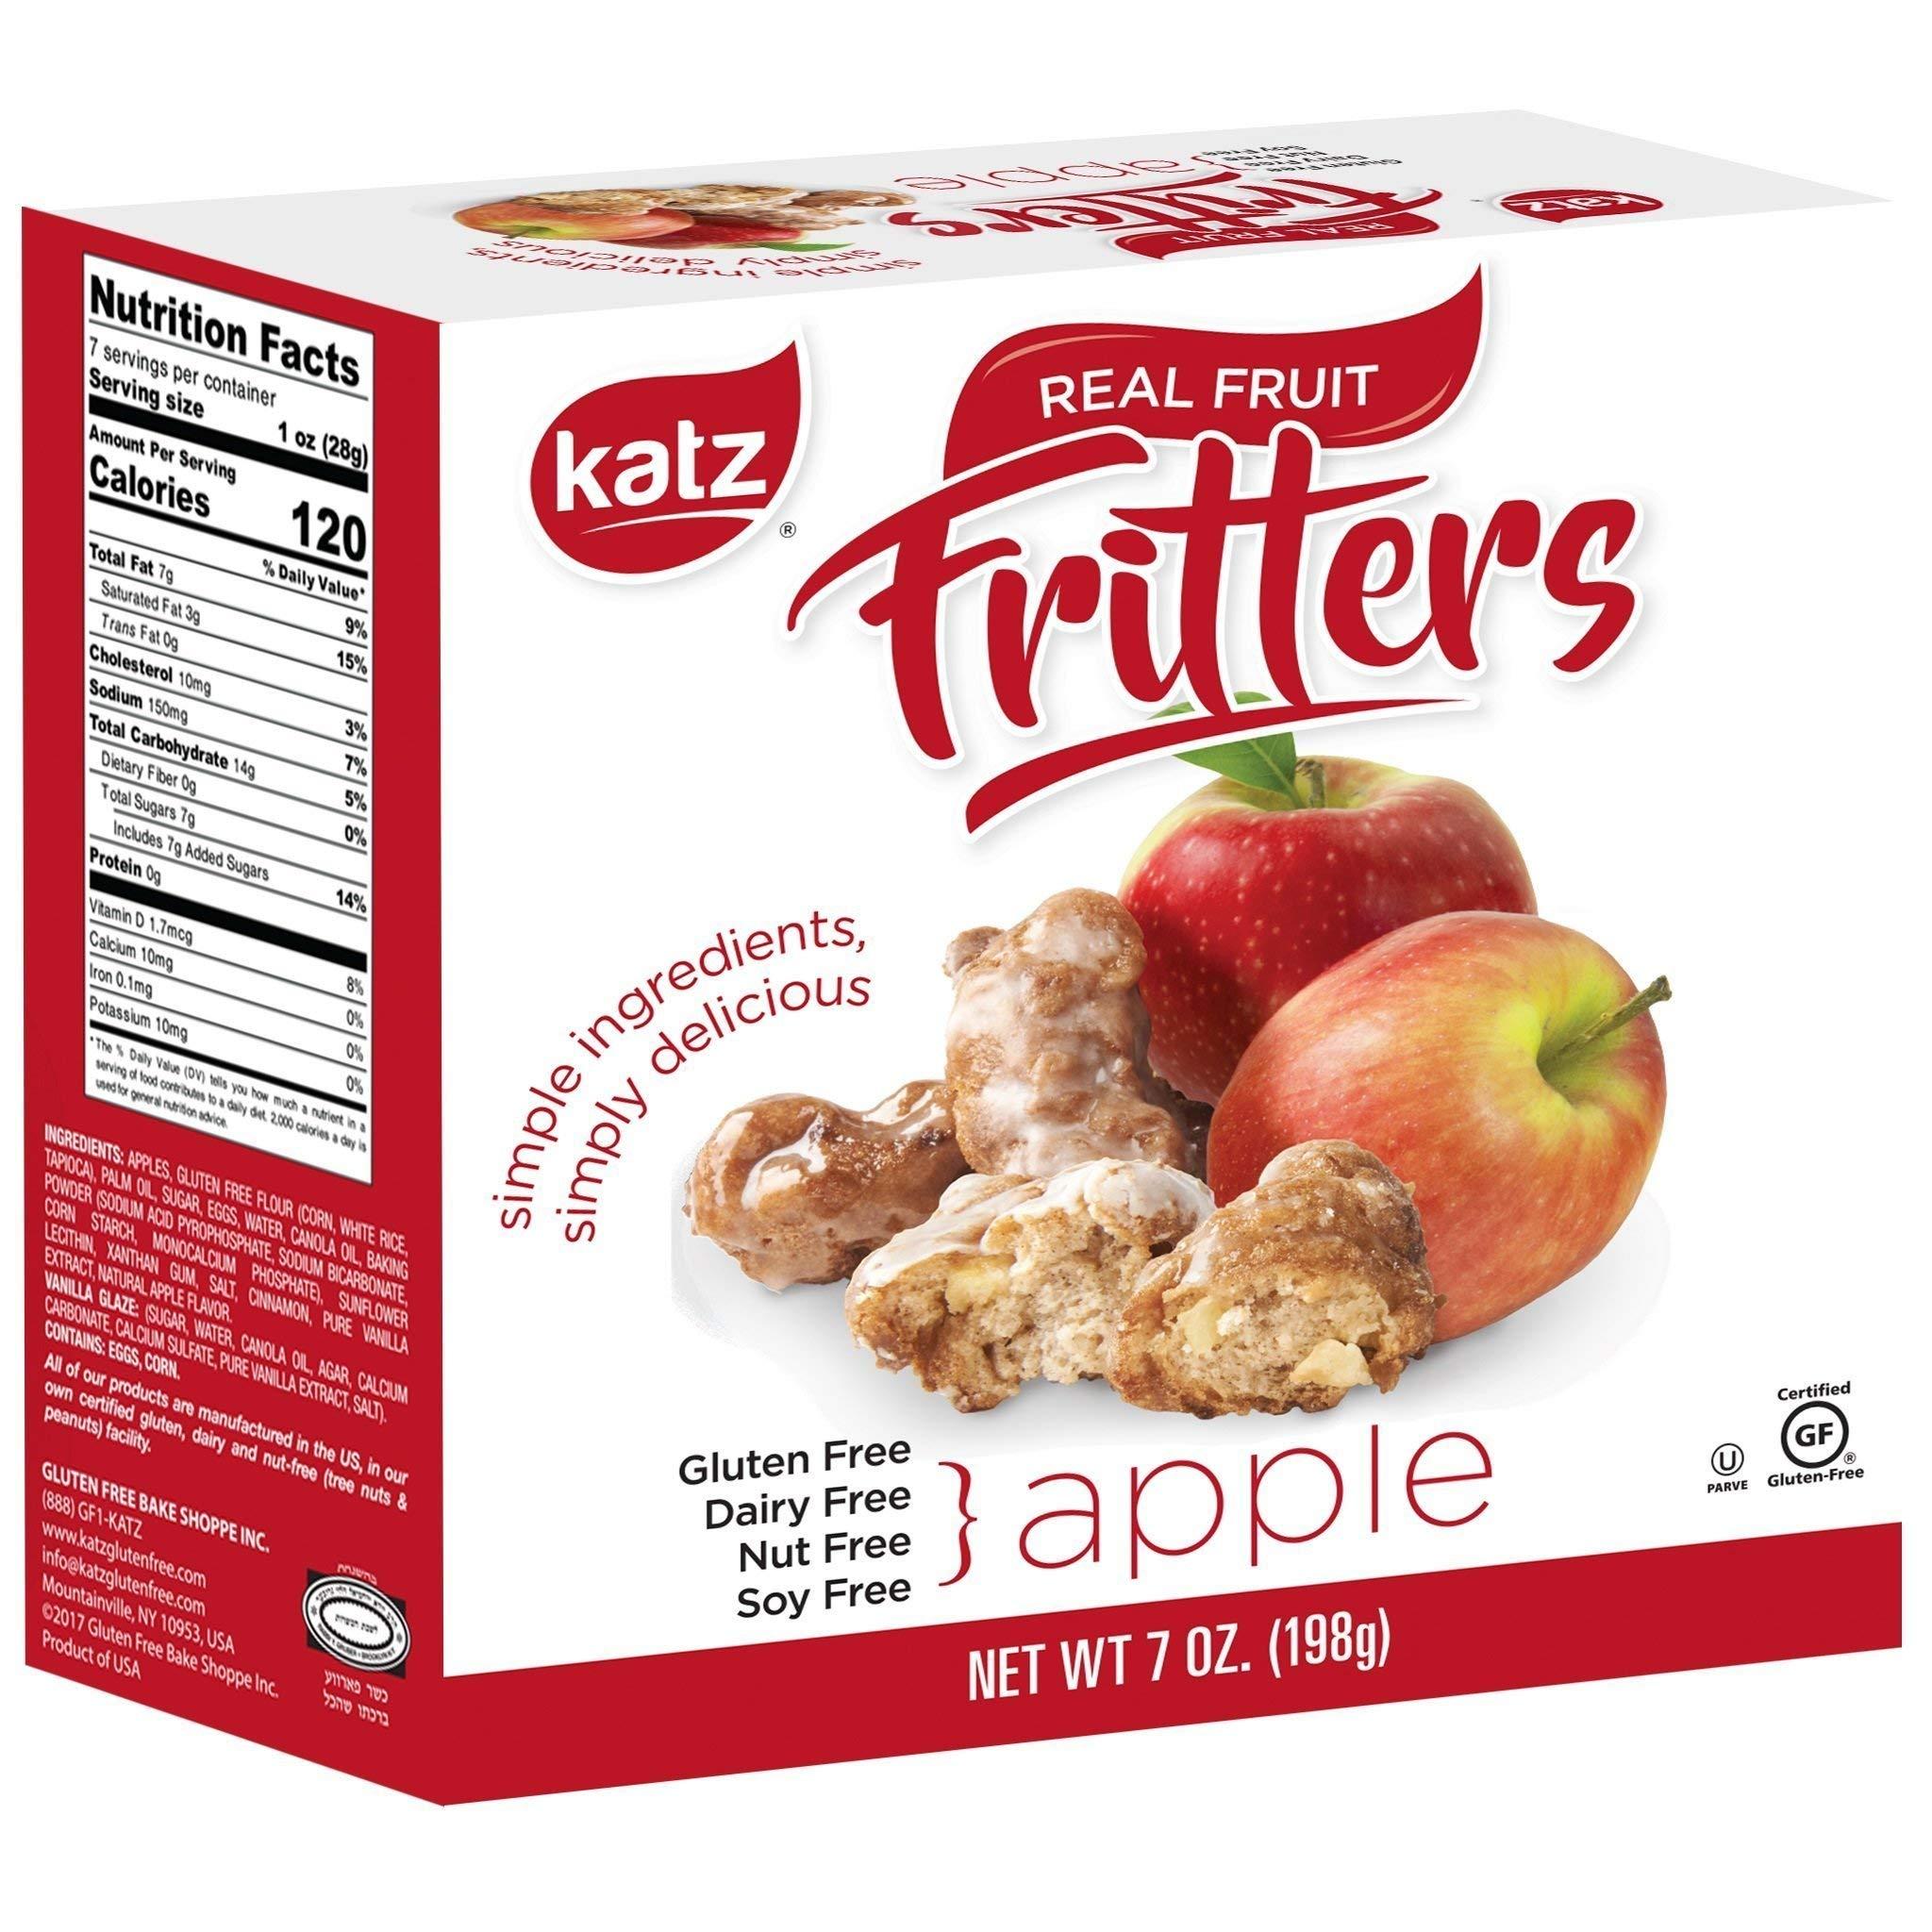 Katz Gluten Free Fritter Bites